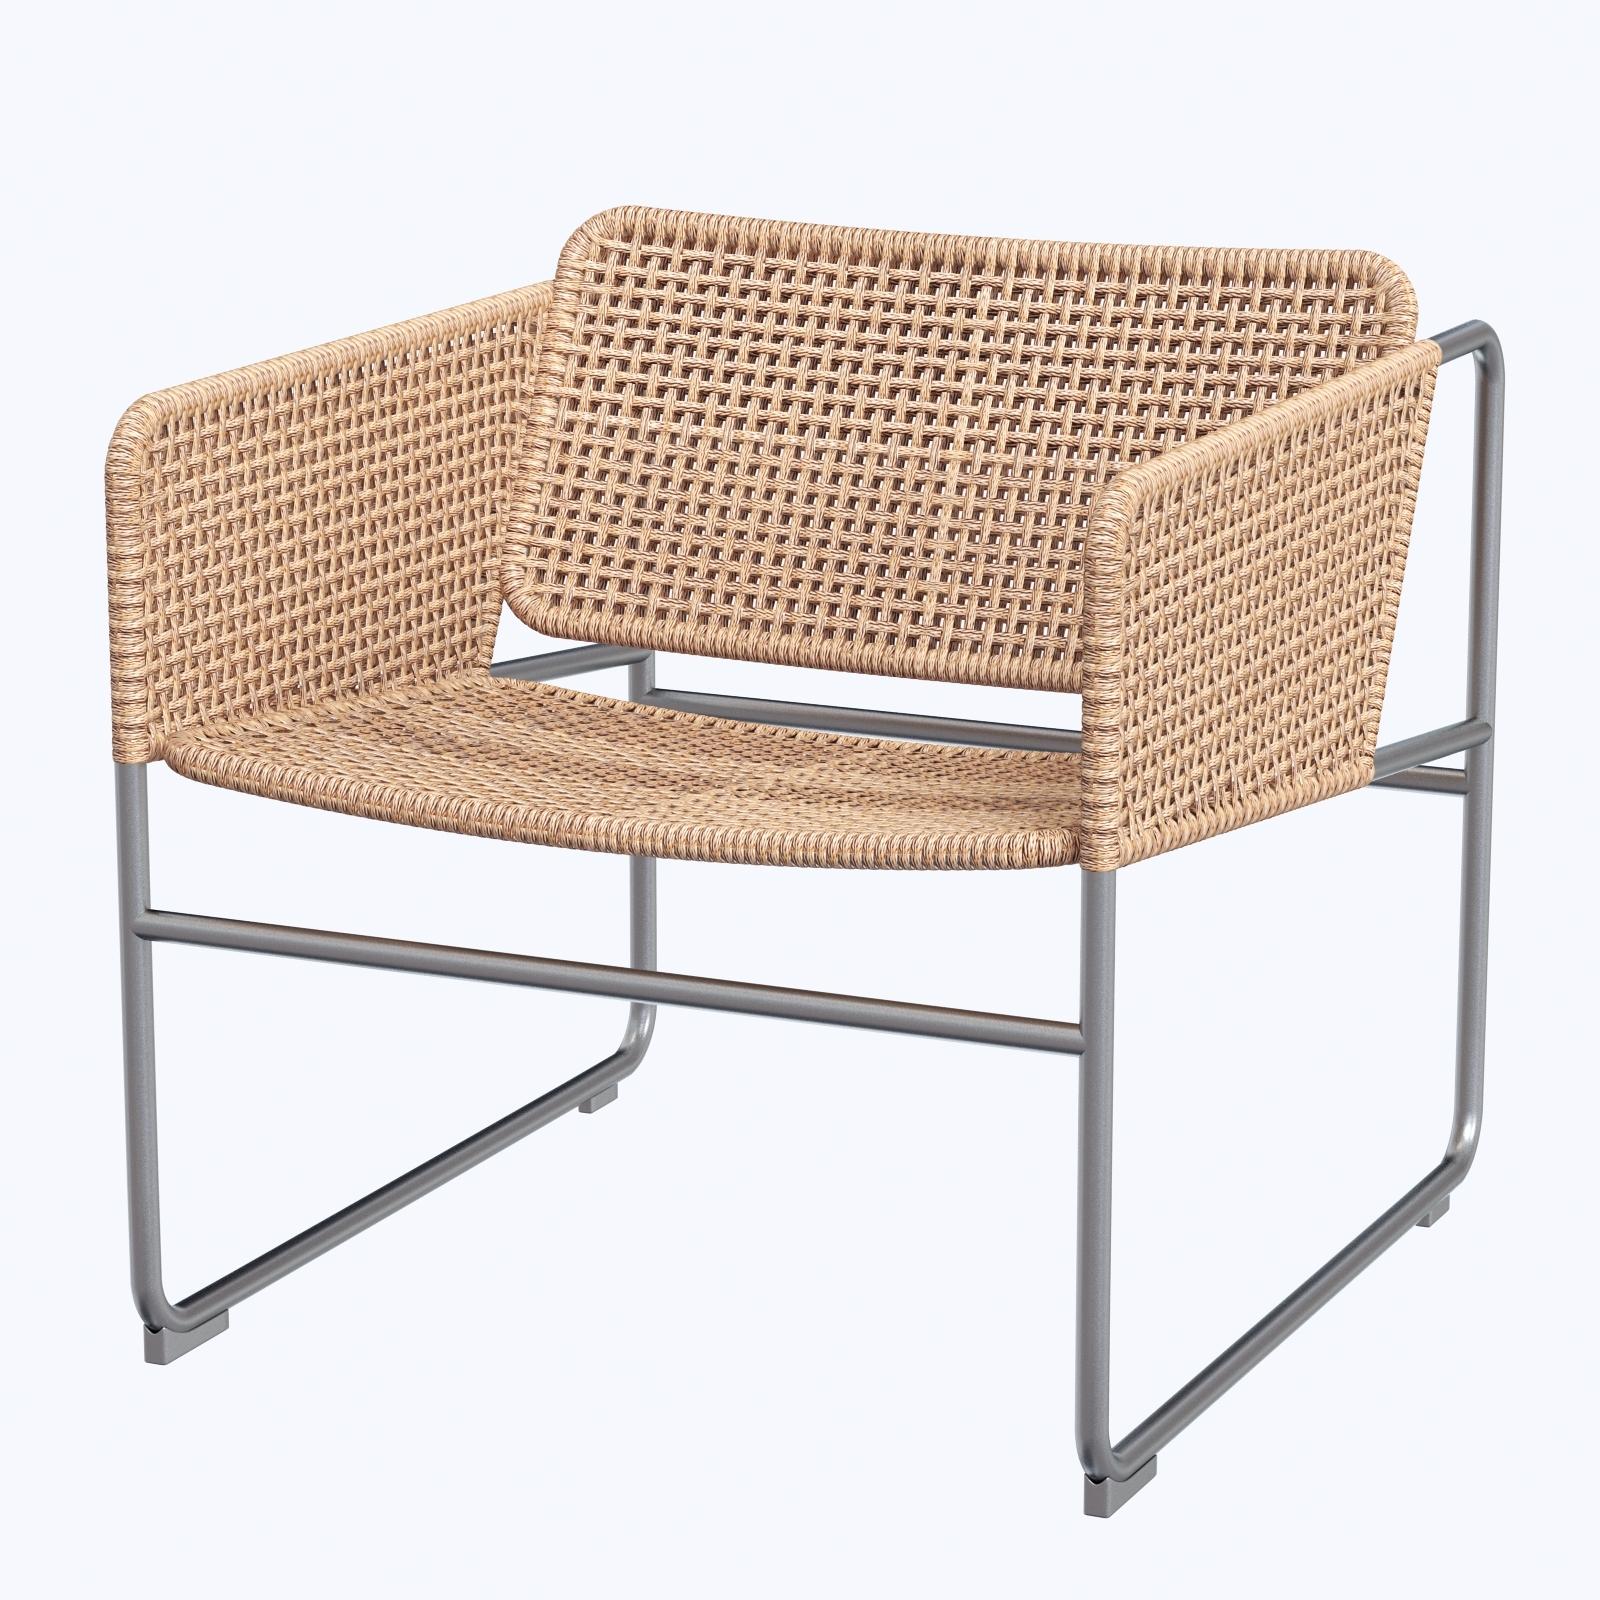 Full Size of Sessel Ikea Industriell Naturgrau 3d Modell Turbosquid 1319767 Hängesessel Garten Miniküche Betten 160x200 Schlafzimmer Küche Kaufen Bei Sofa Mit Wohnzimmer Sessel Ikea